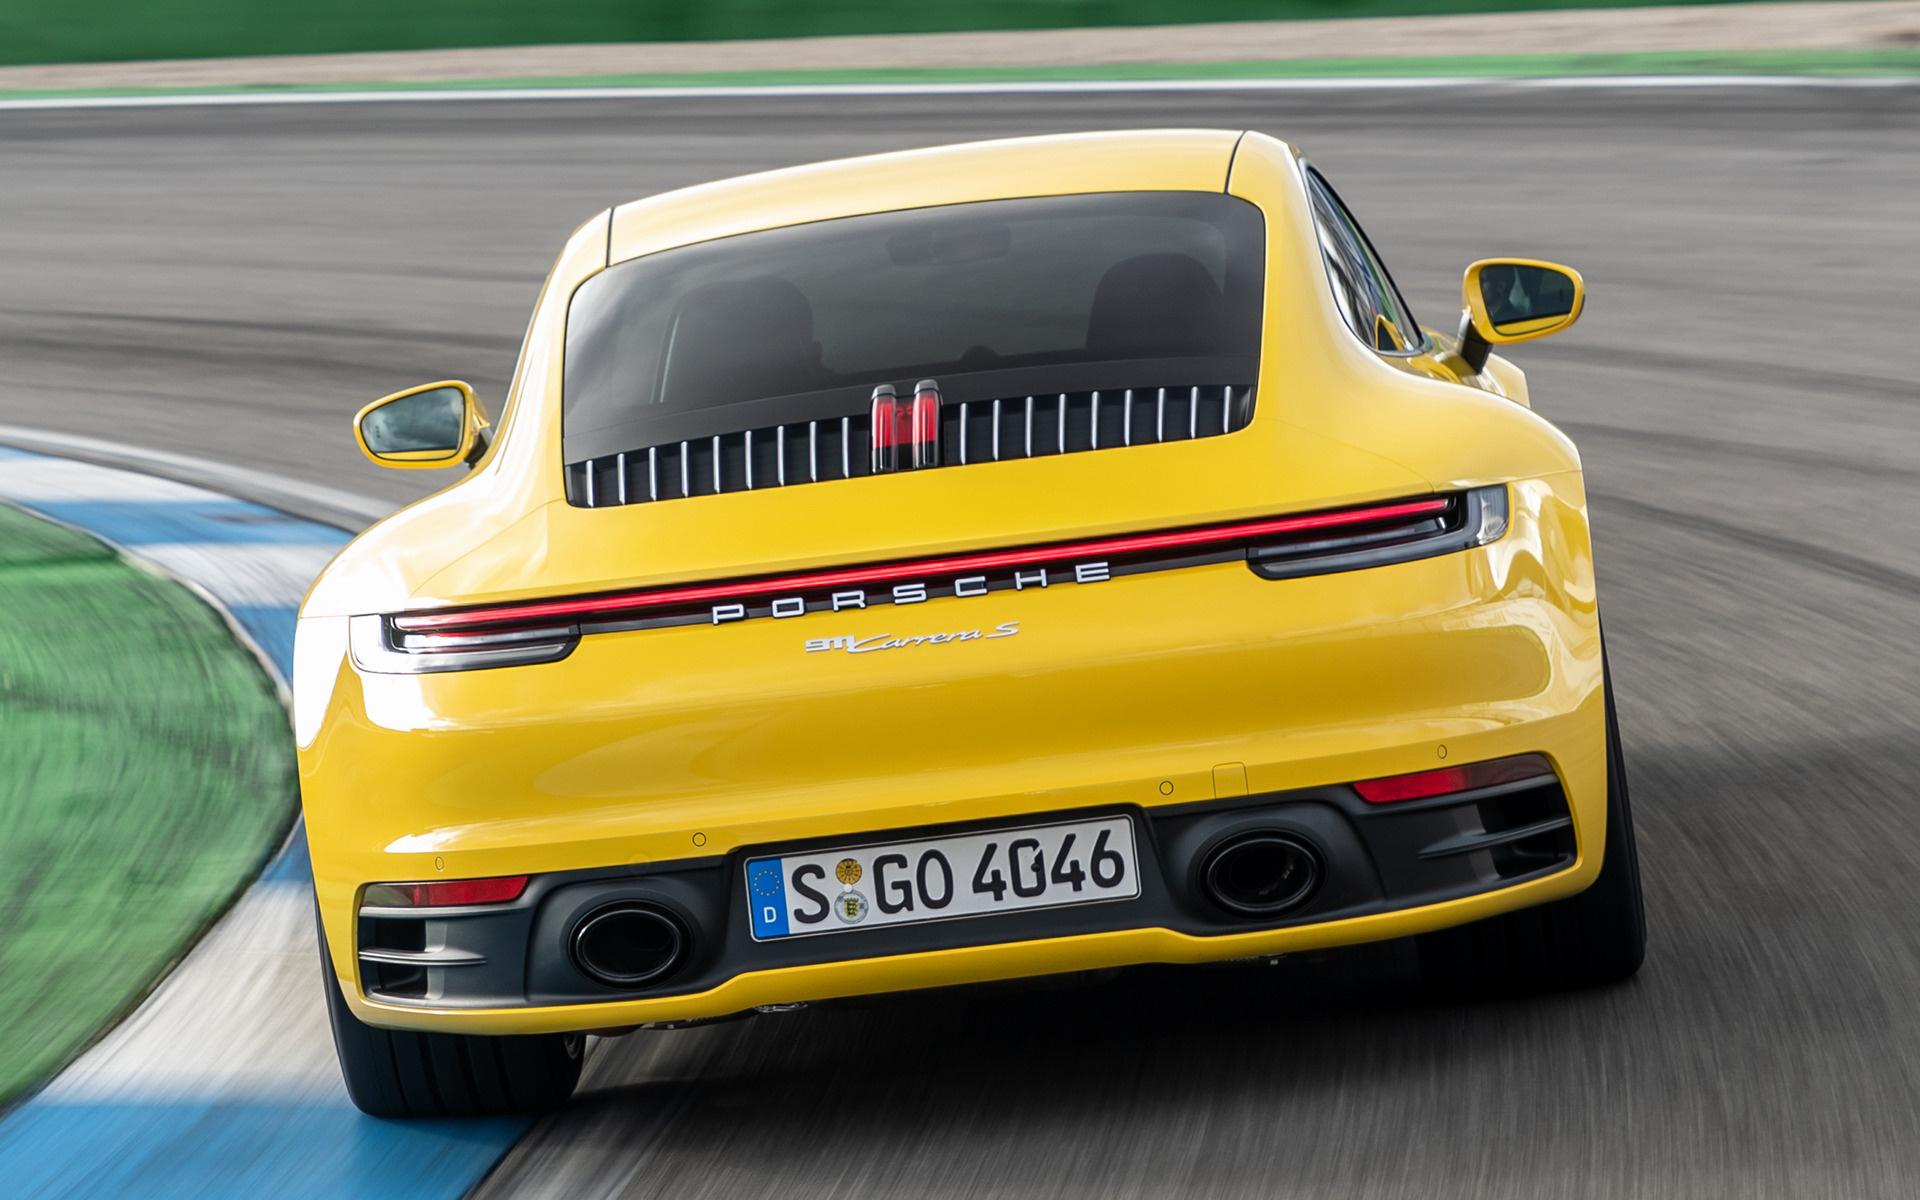 2019 Porsche 911 Carrera S Wallpapers And Hd Images Car Pixel